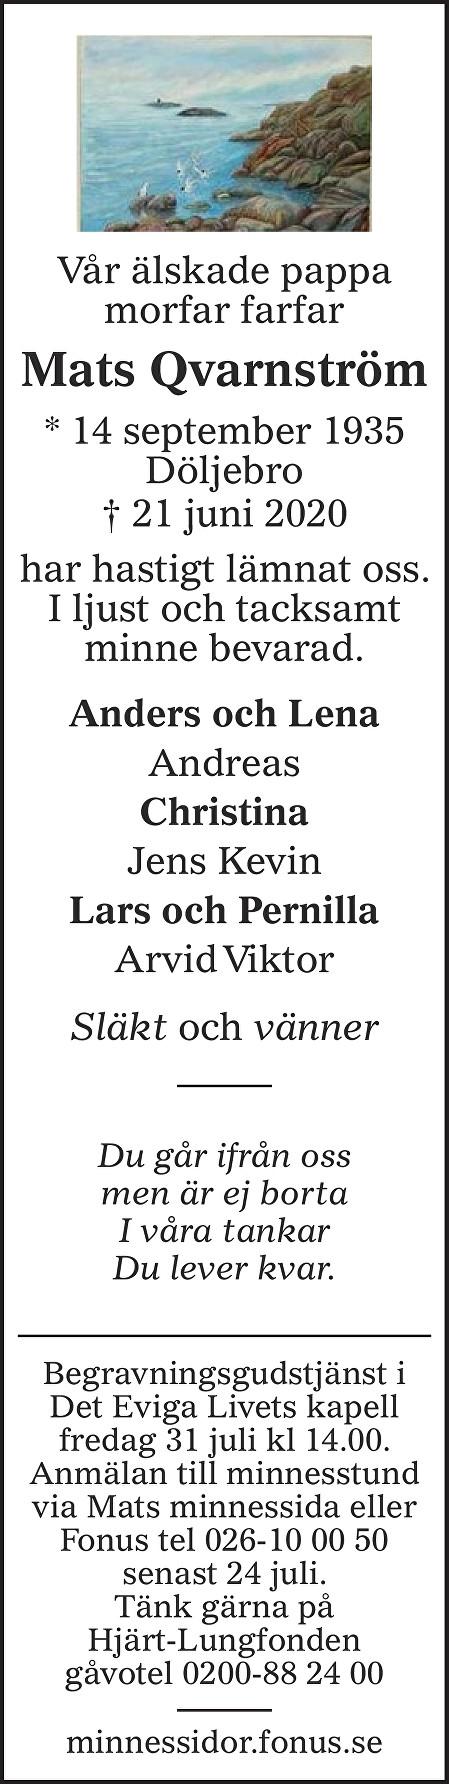 Mats Qvarnström Death notice